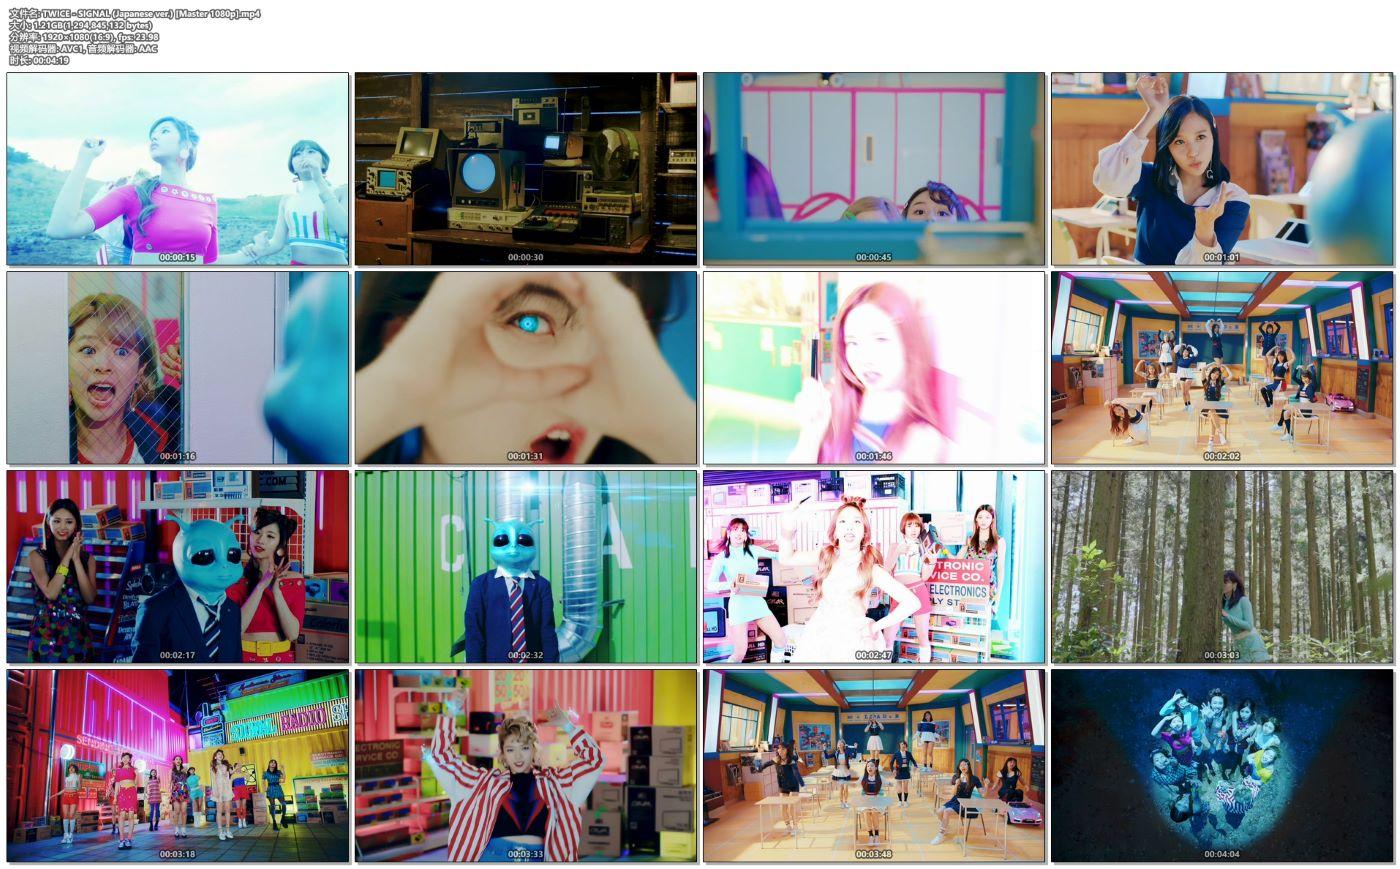 TWICE - SIGNAL (Japanese ver.) [Master 1080p